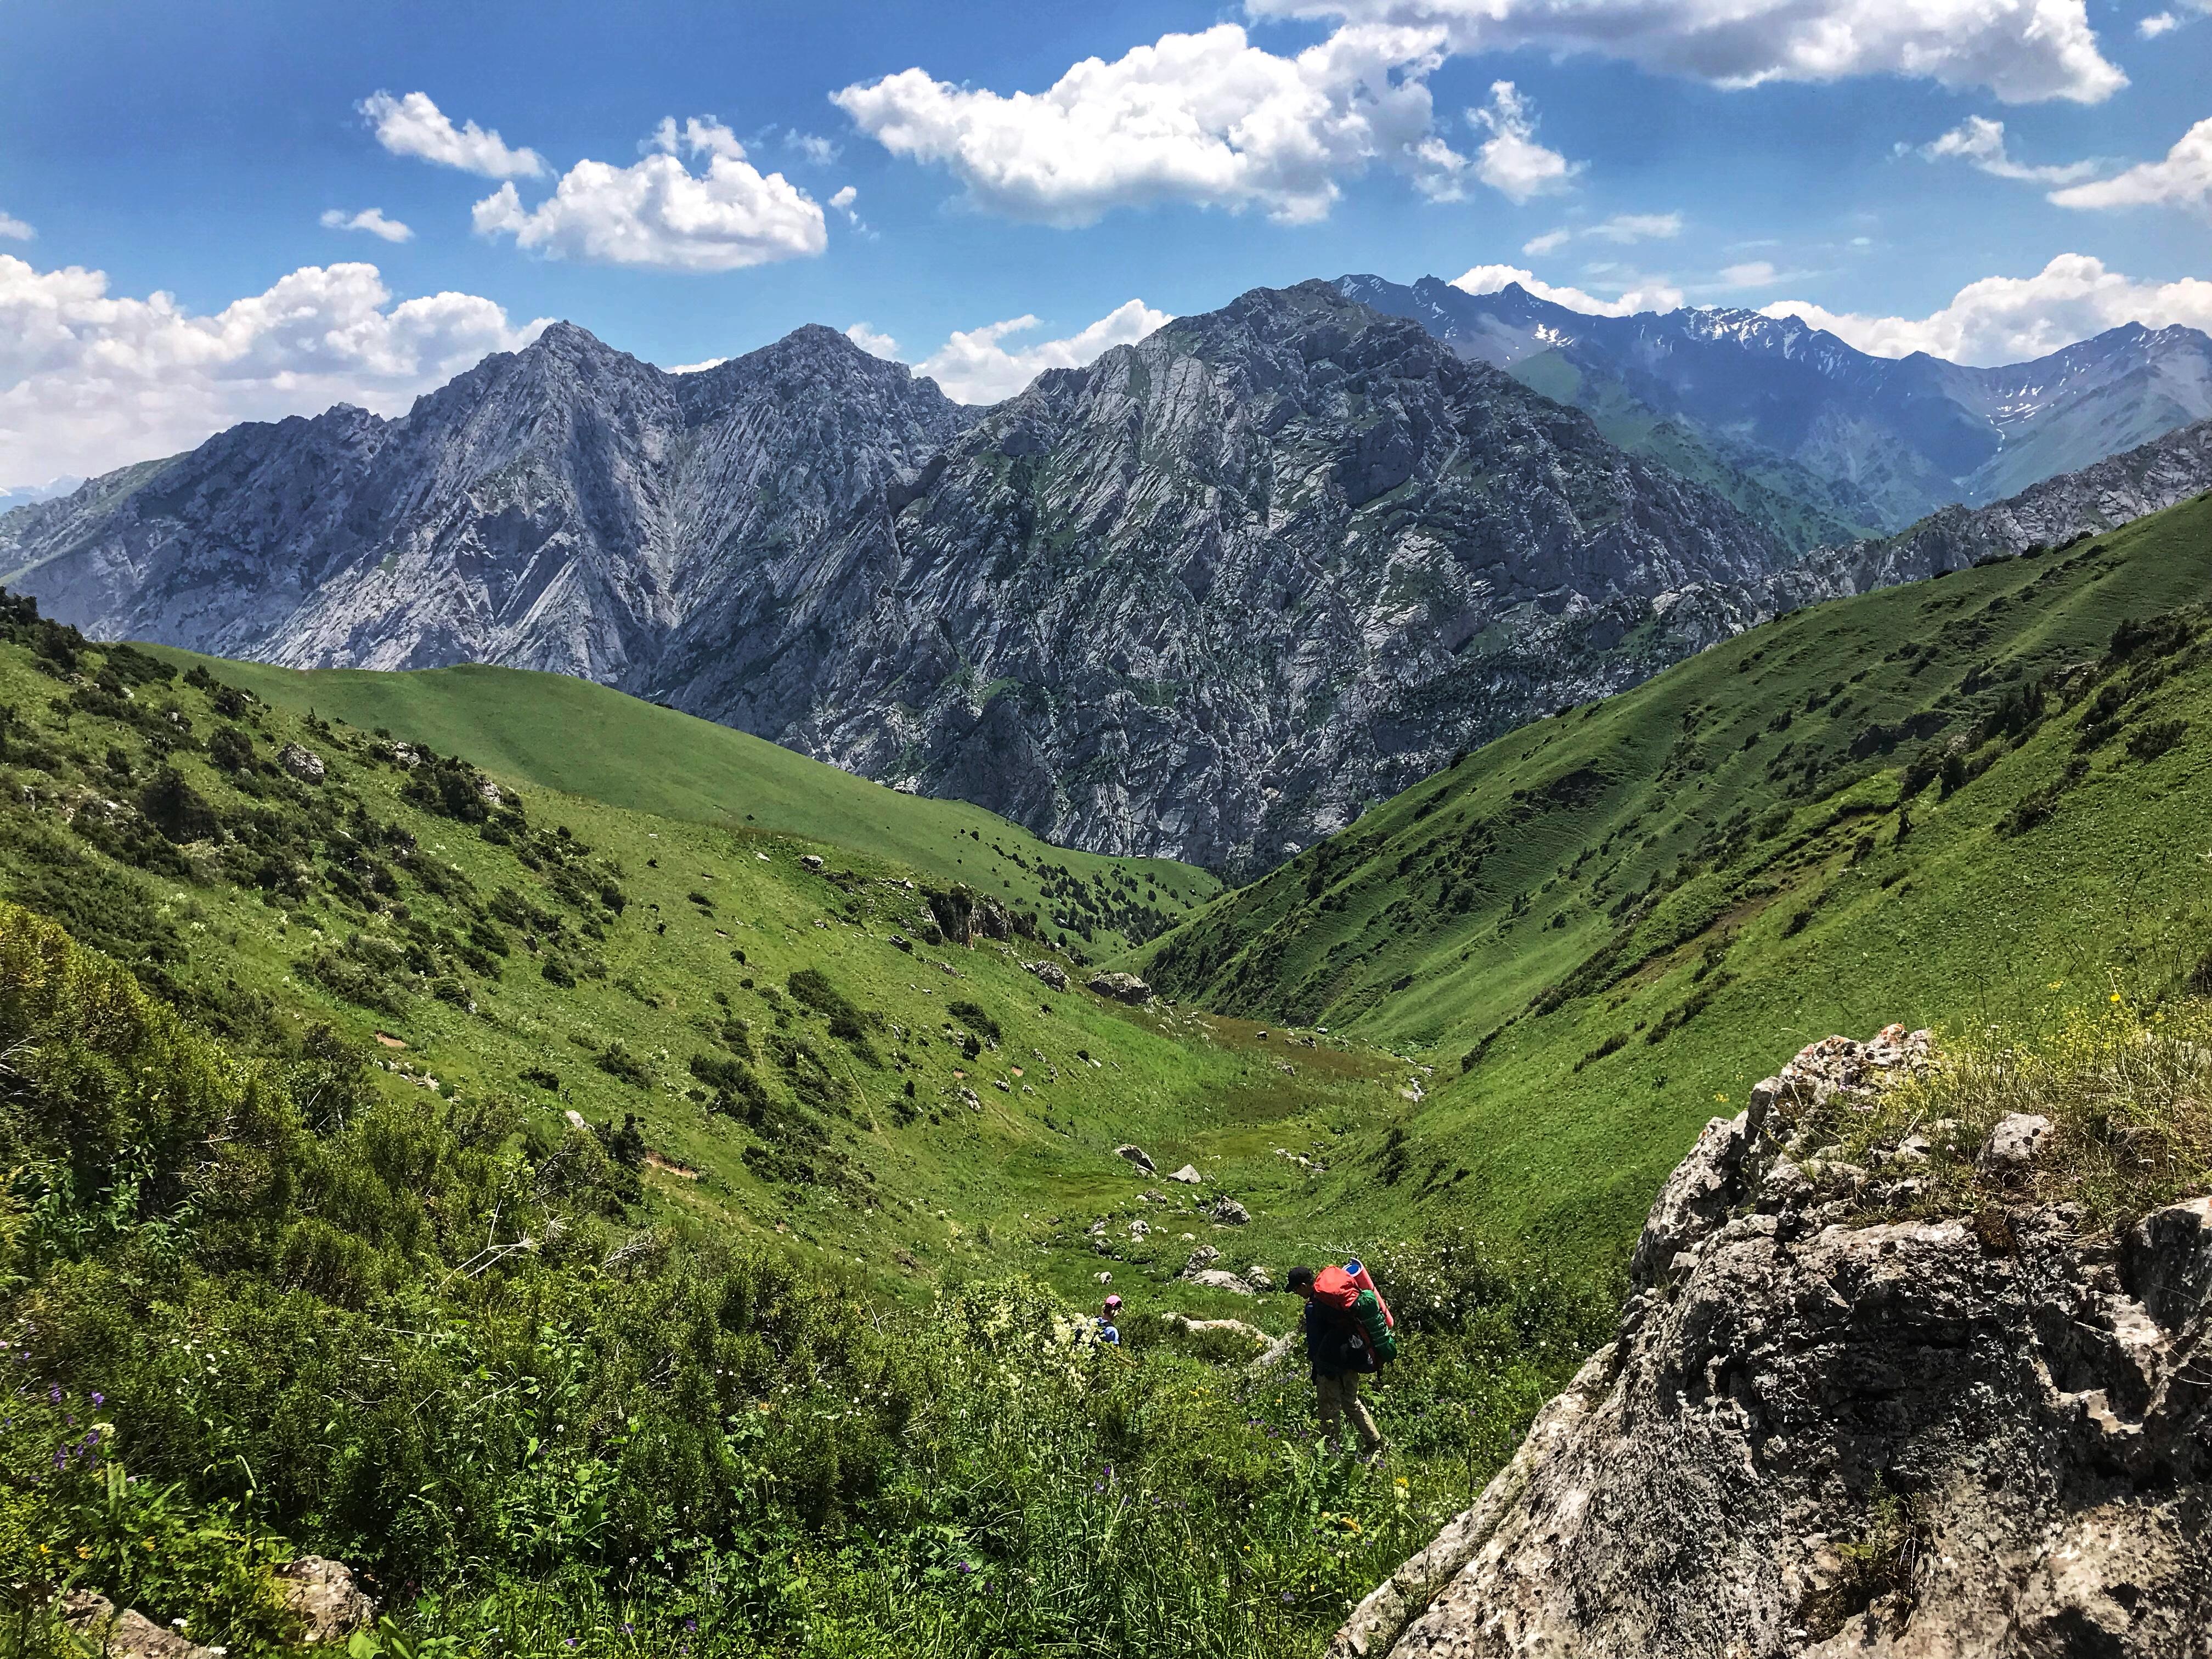 Trekking Kyrgyzstan's Akotor Pass, Day 3 - The Trek